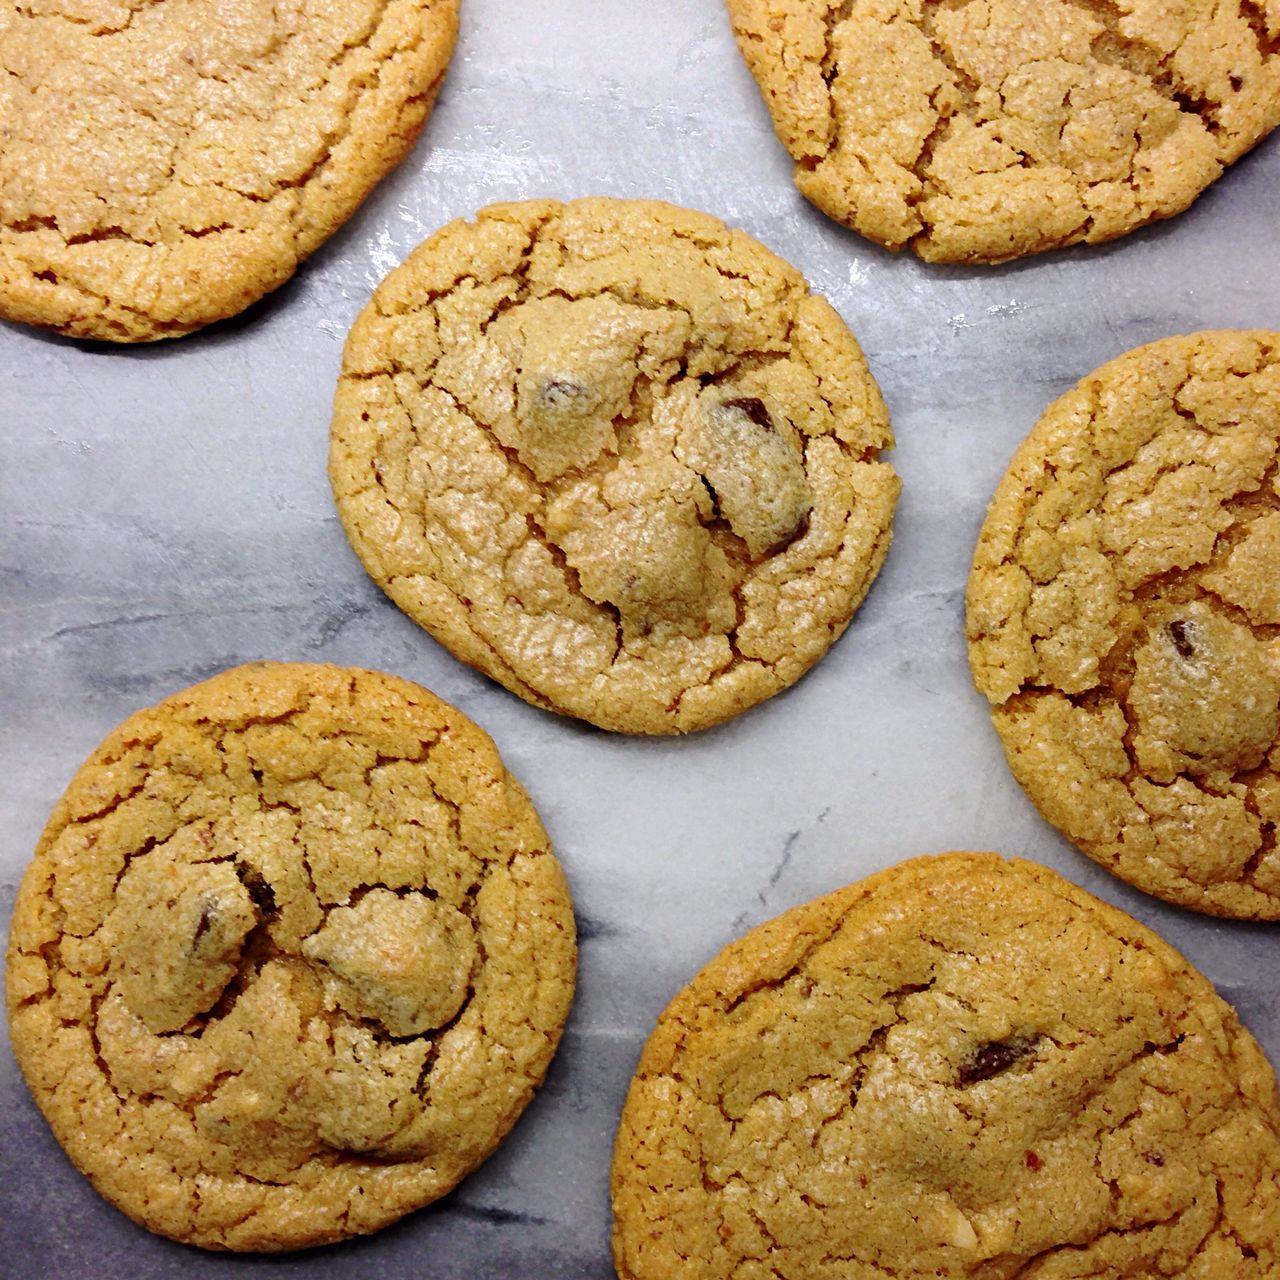 Beautiful stock photos of schokolade, Baking Stray, Close-Up, Cookie, Dessert